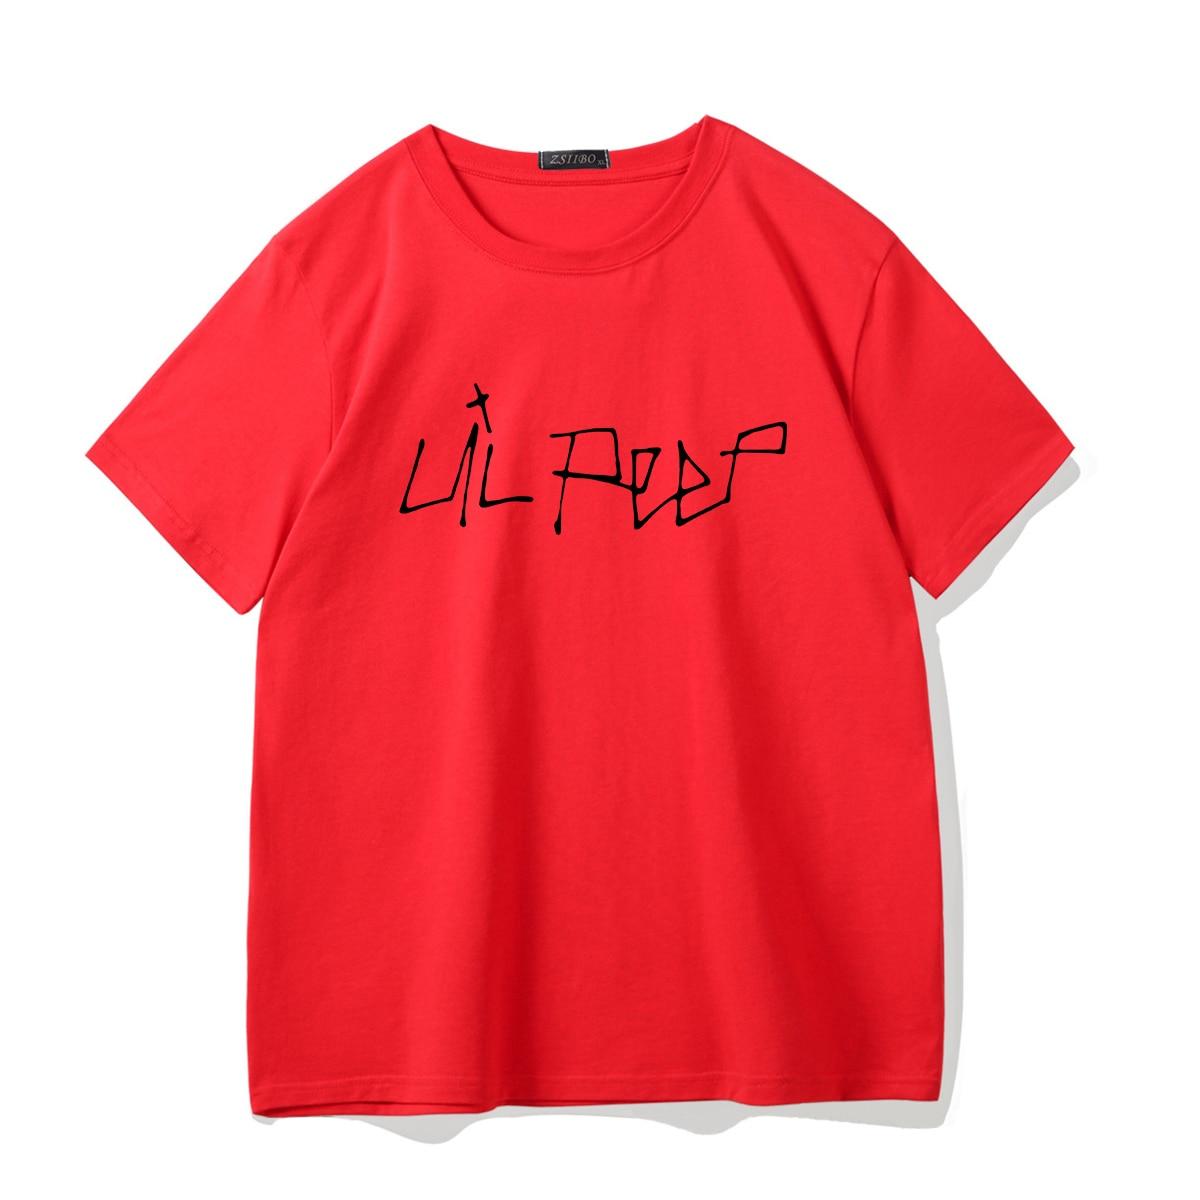 Lil Peep Printed Hip Hop T-shirt